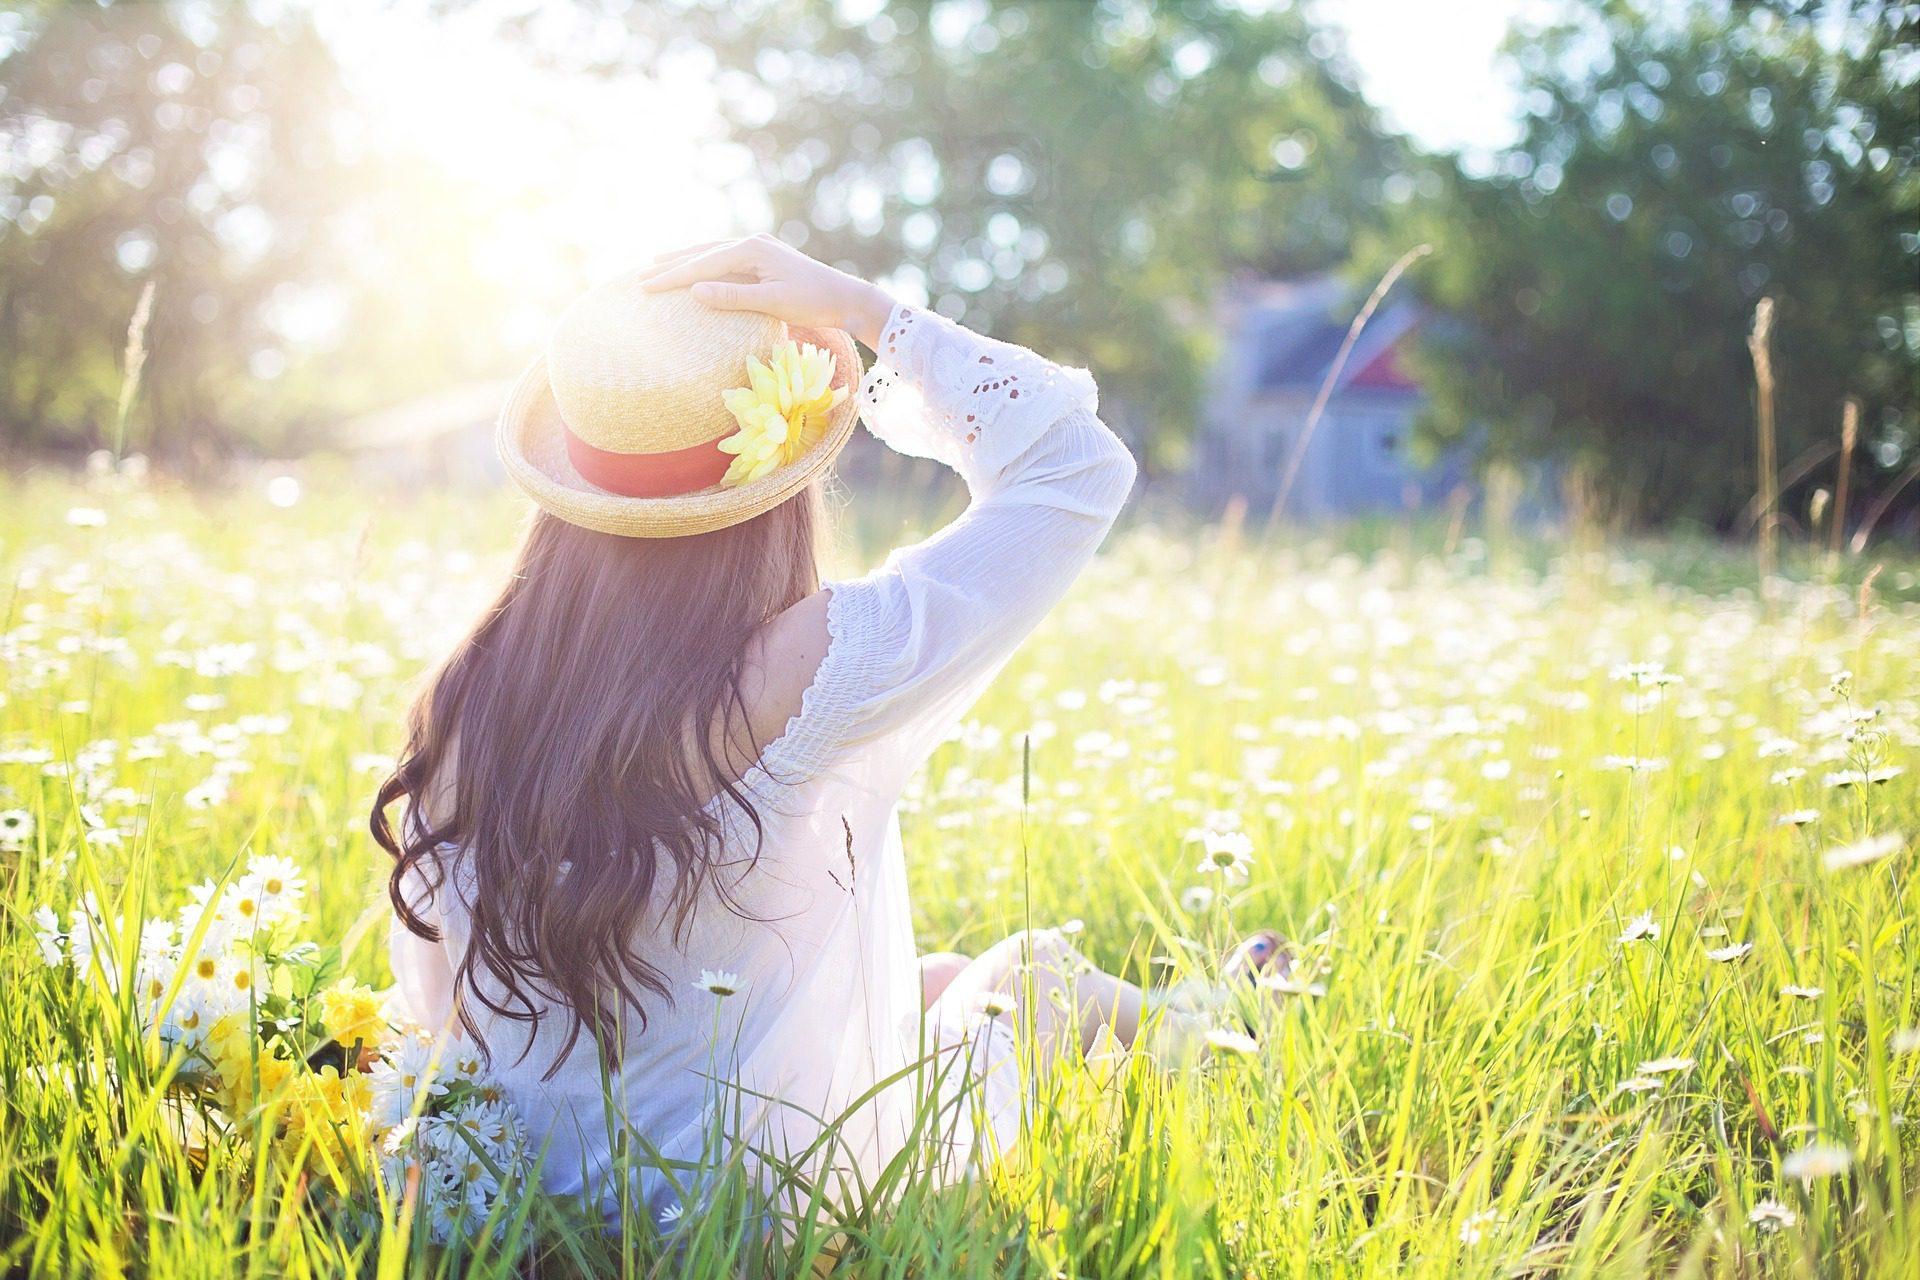 How to Avoid Common Summer Illnesses